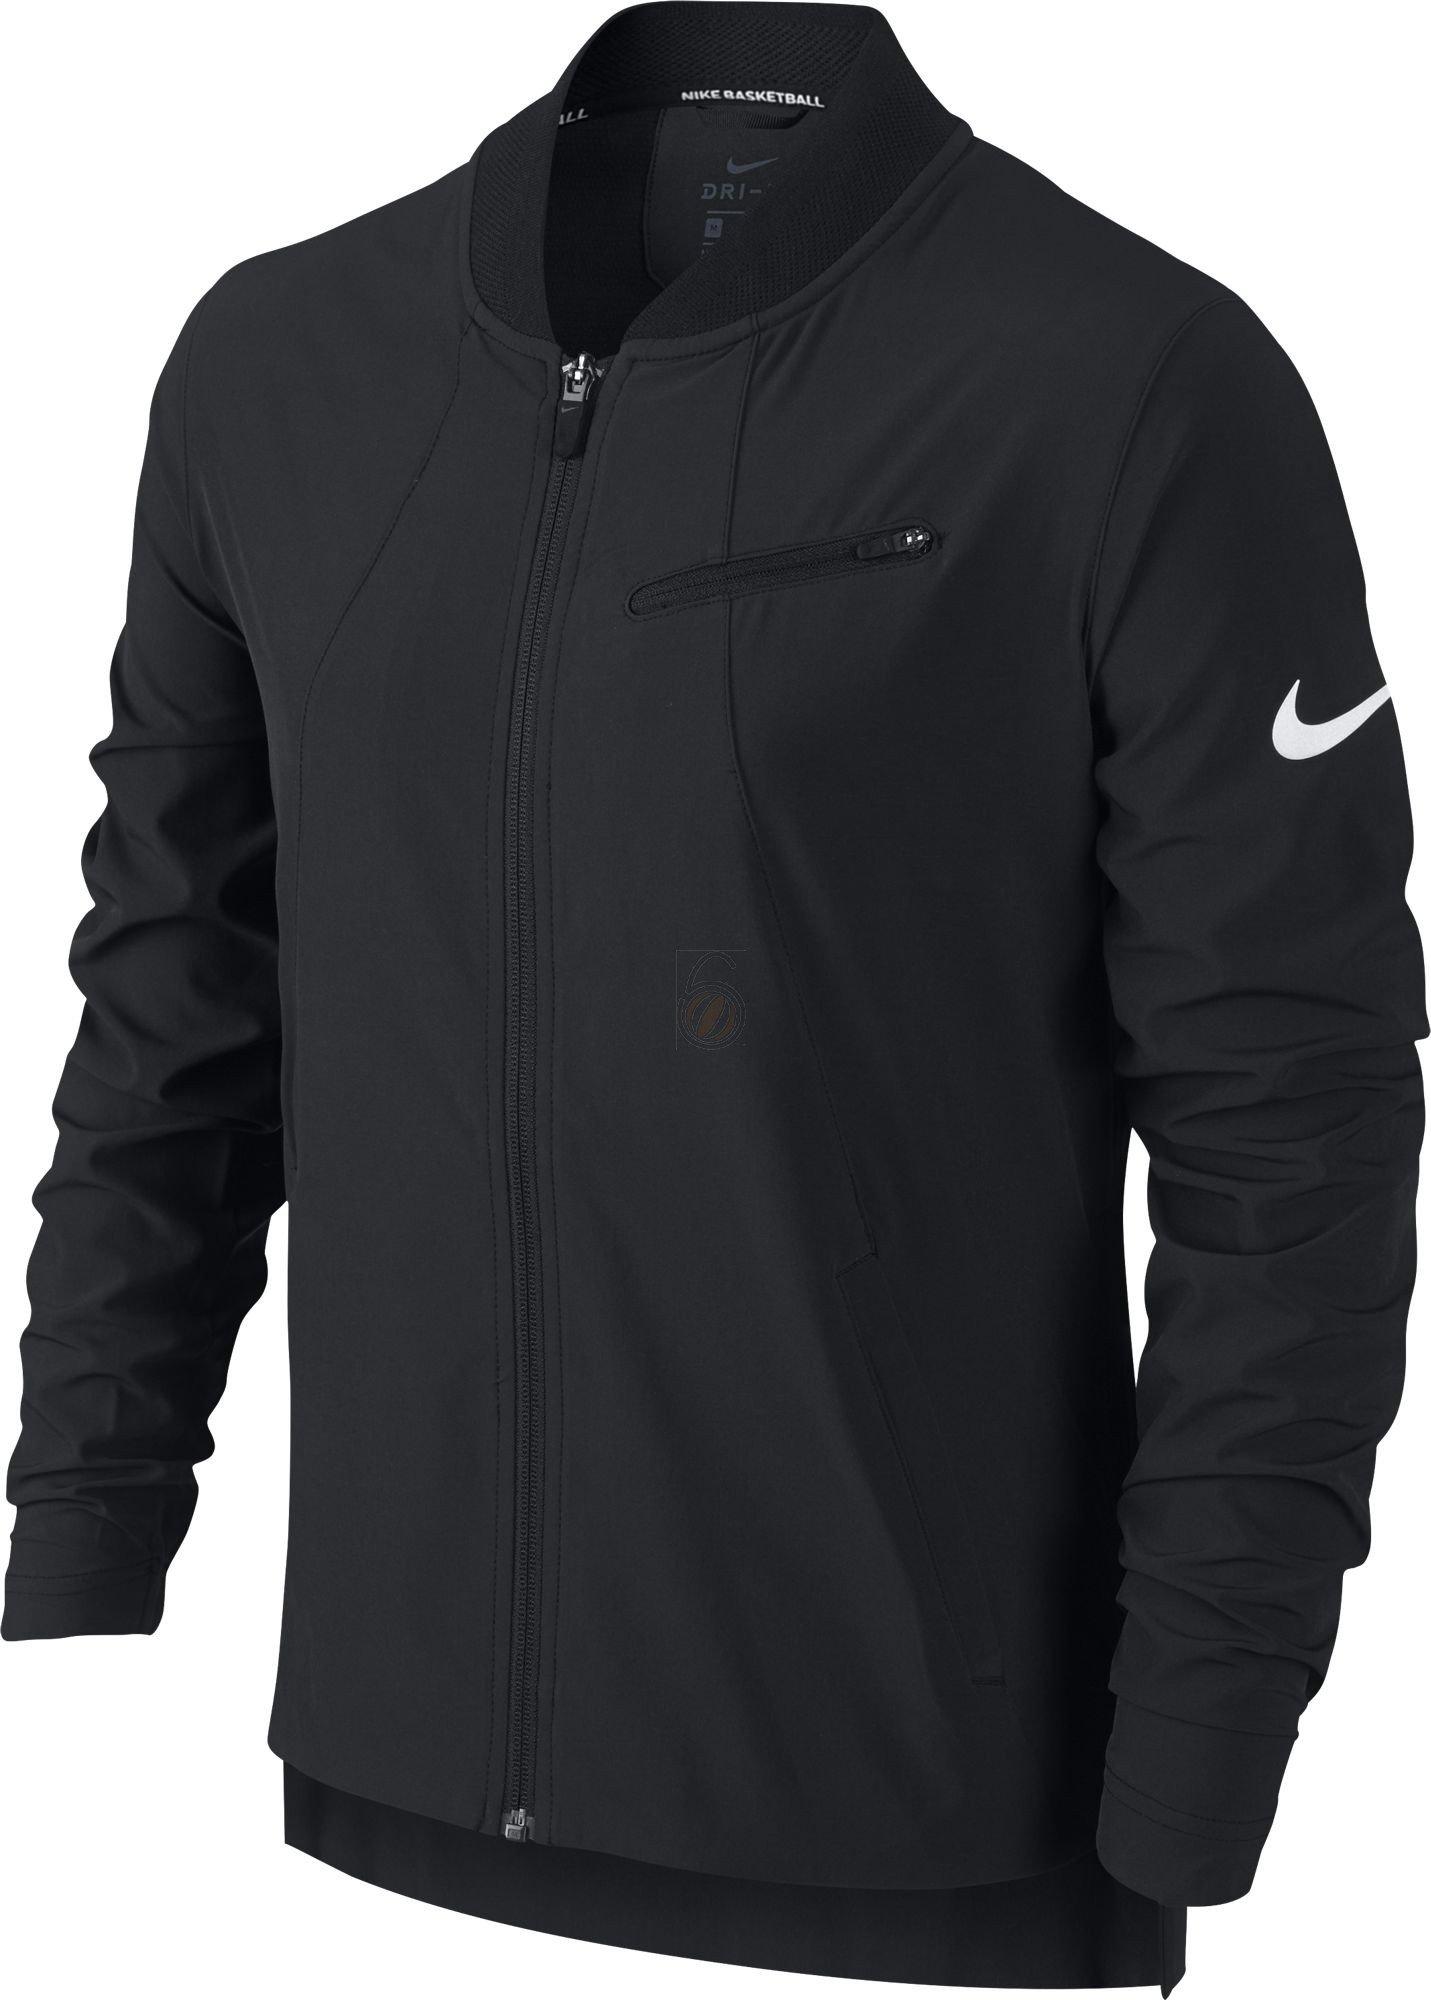 Basketball jacket